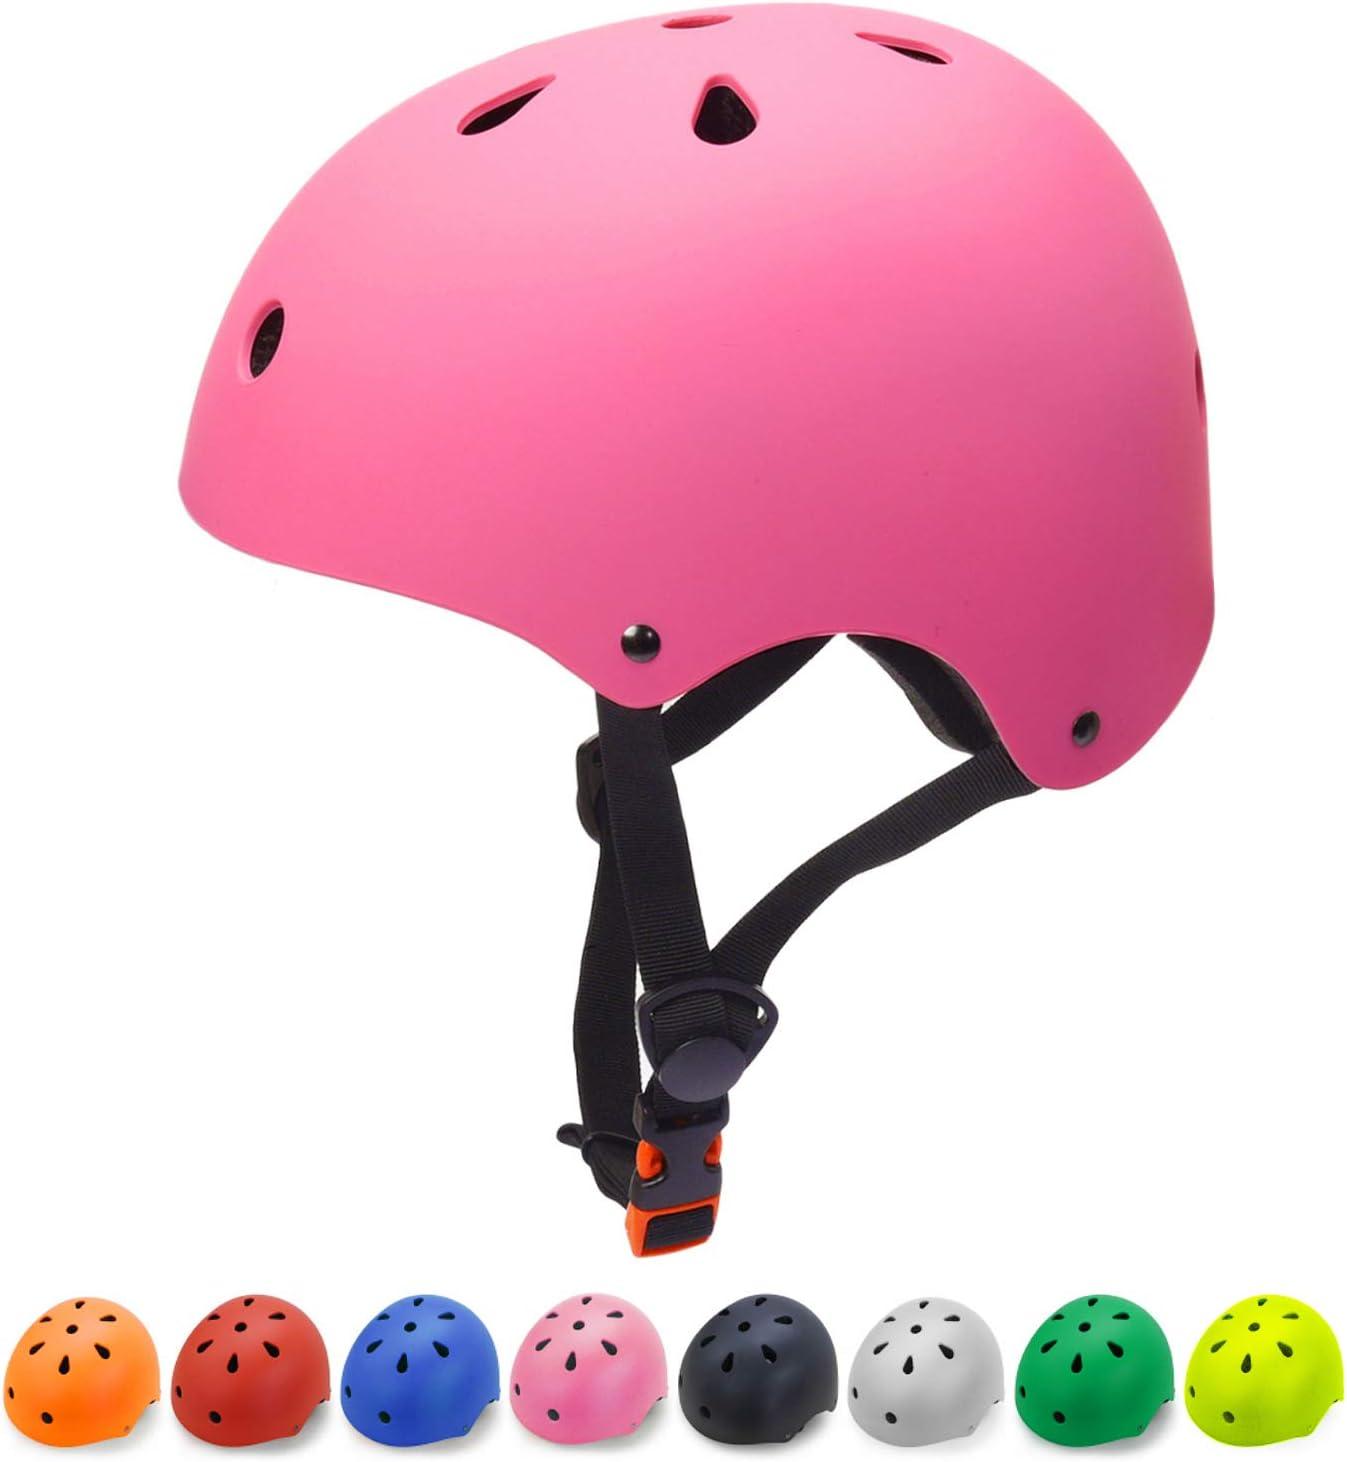 Glaf Kids Bike Helmet Toddler Helmet Children Multi-Sport Helmet CPSC Certified Impact Resistance Ventilation Adjustable Helmet Youth Kids Skateboard Cycling Helmet